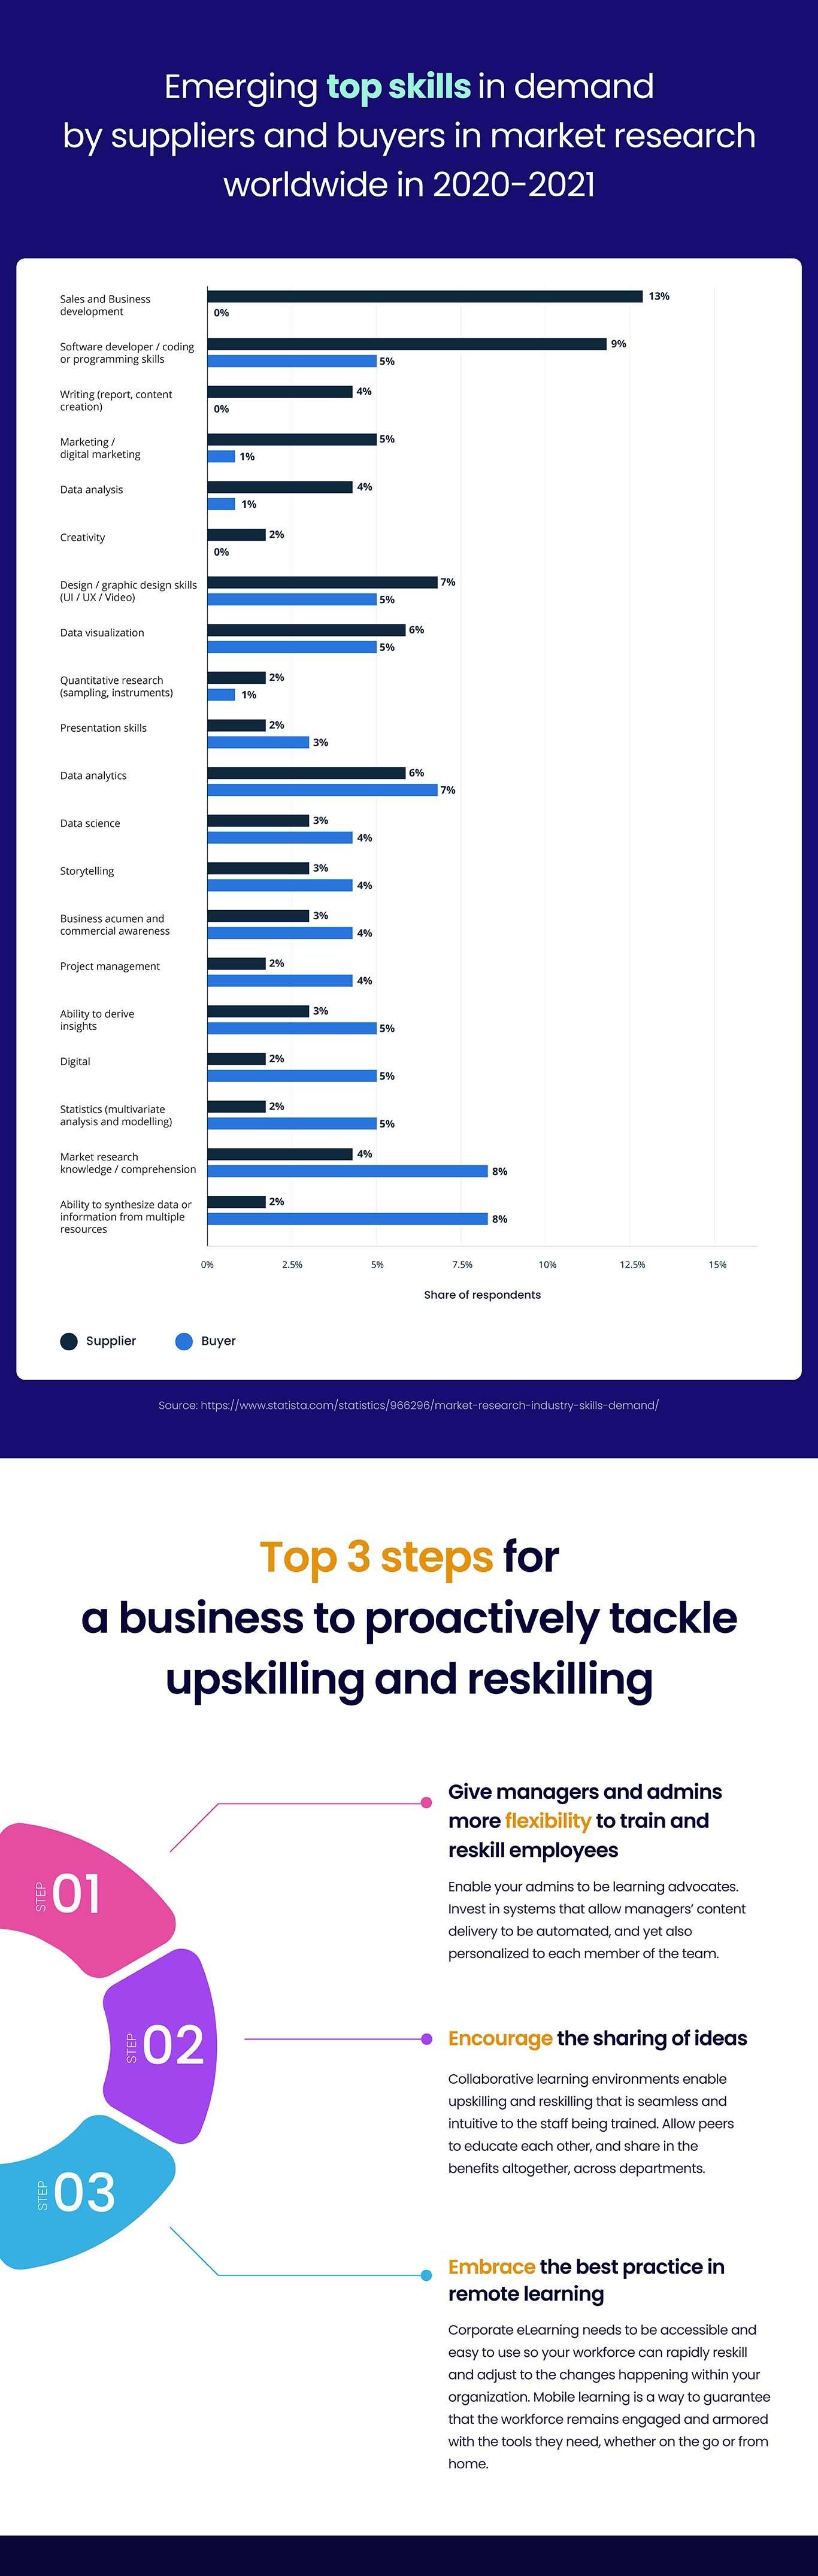 Infographic Trends 2021-2022 Upskilling Reskilling 2